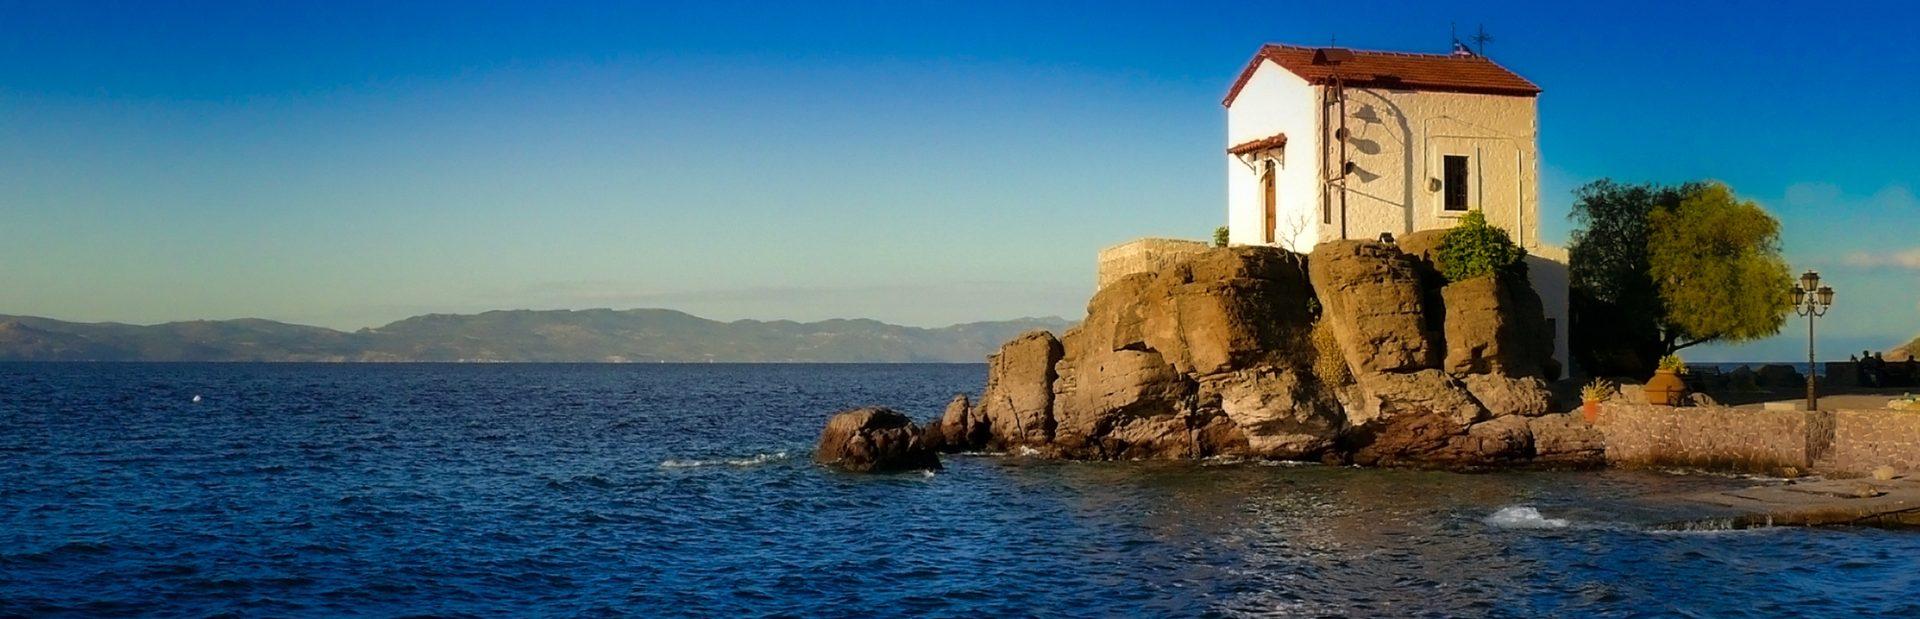 Aegean Islands charter itineraries